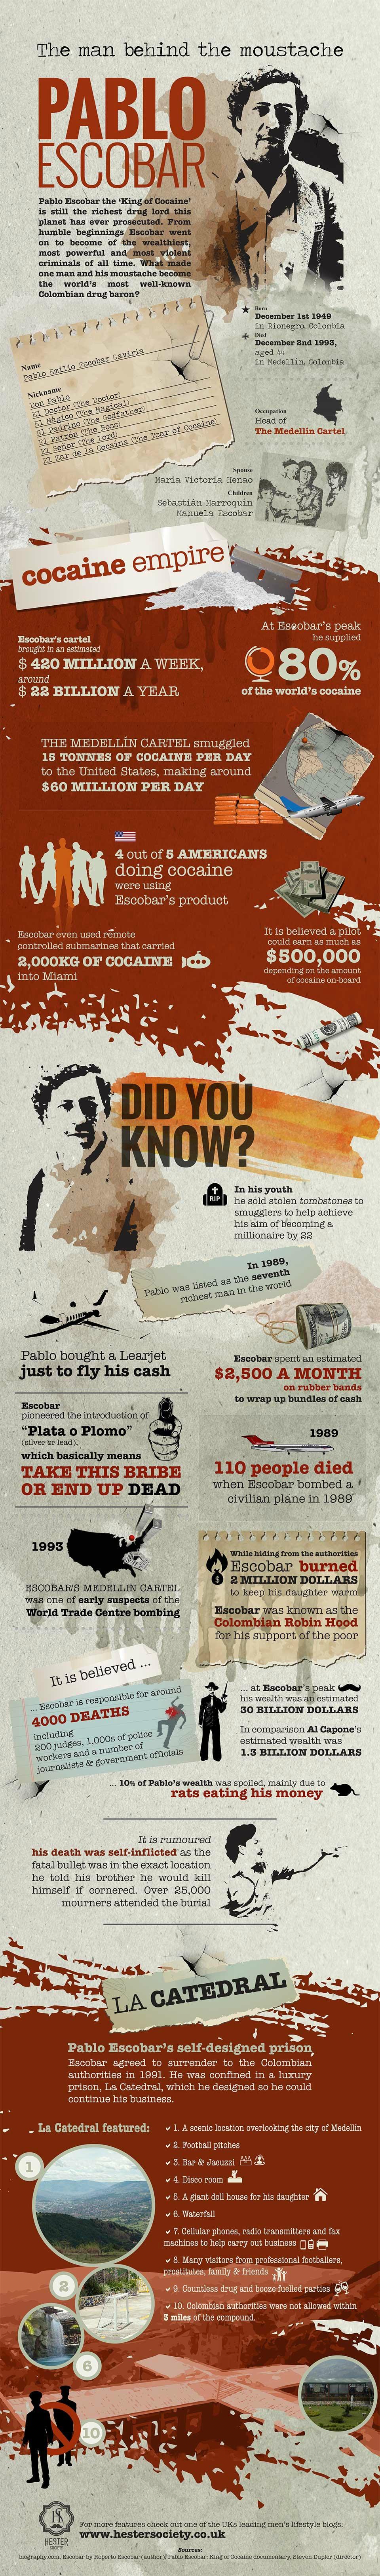 Pablo Escobar: The Man Behind The Moustache